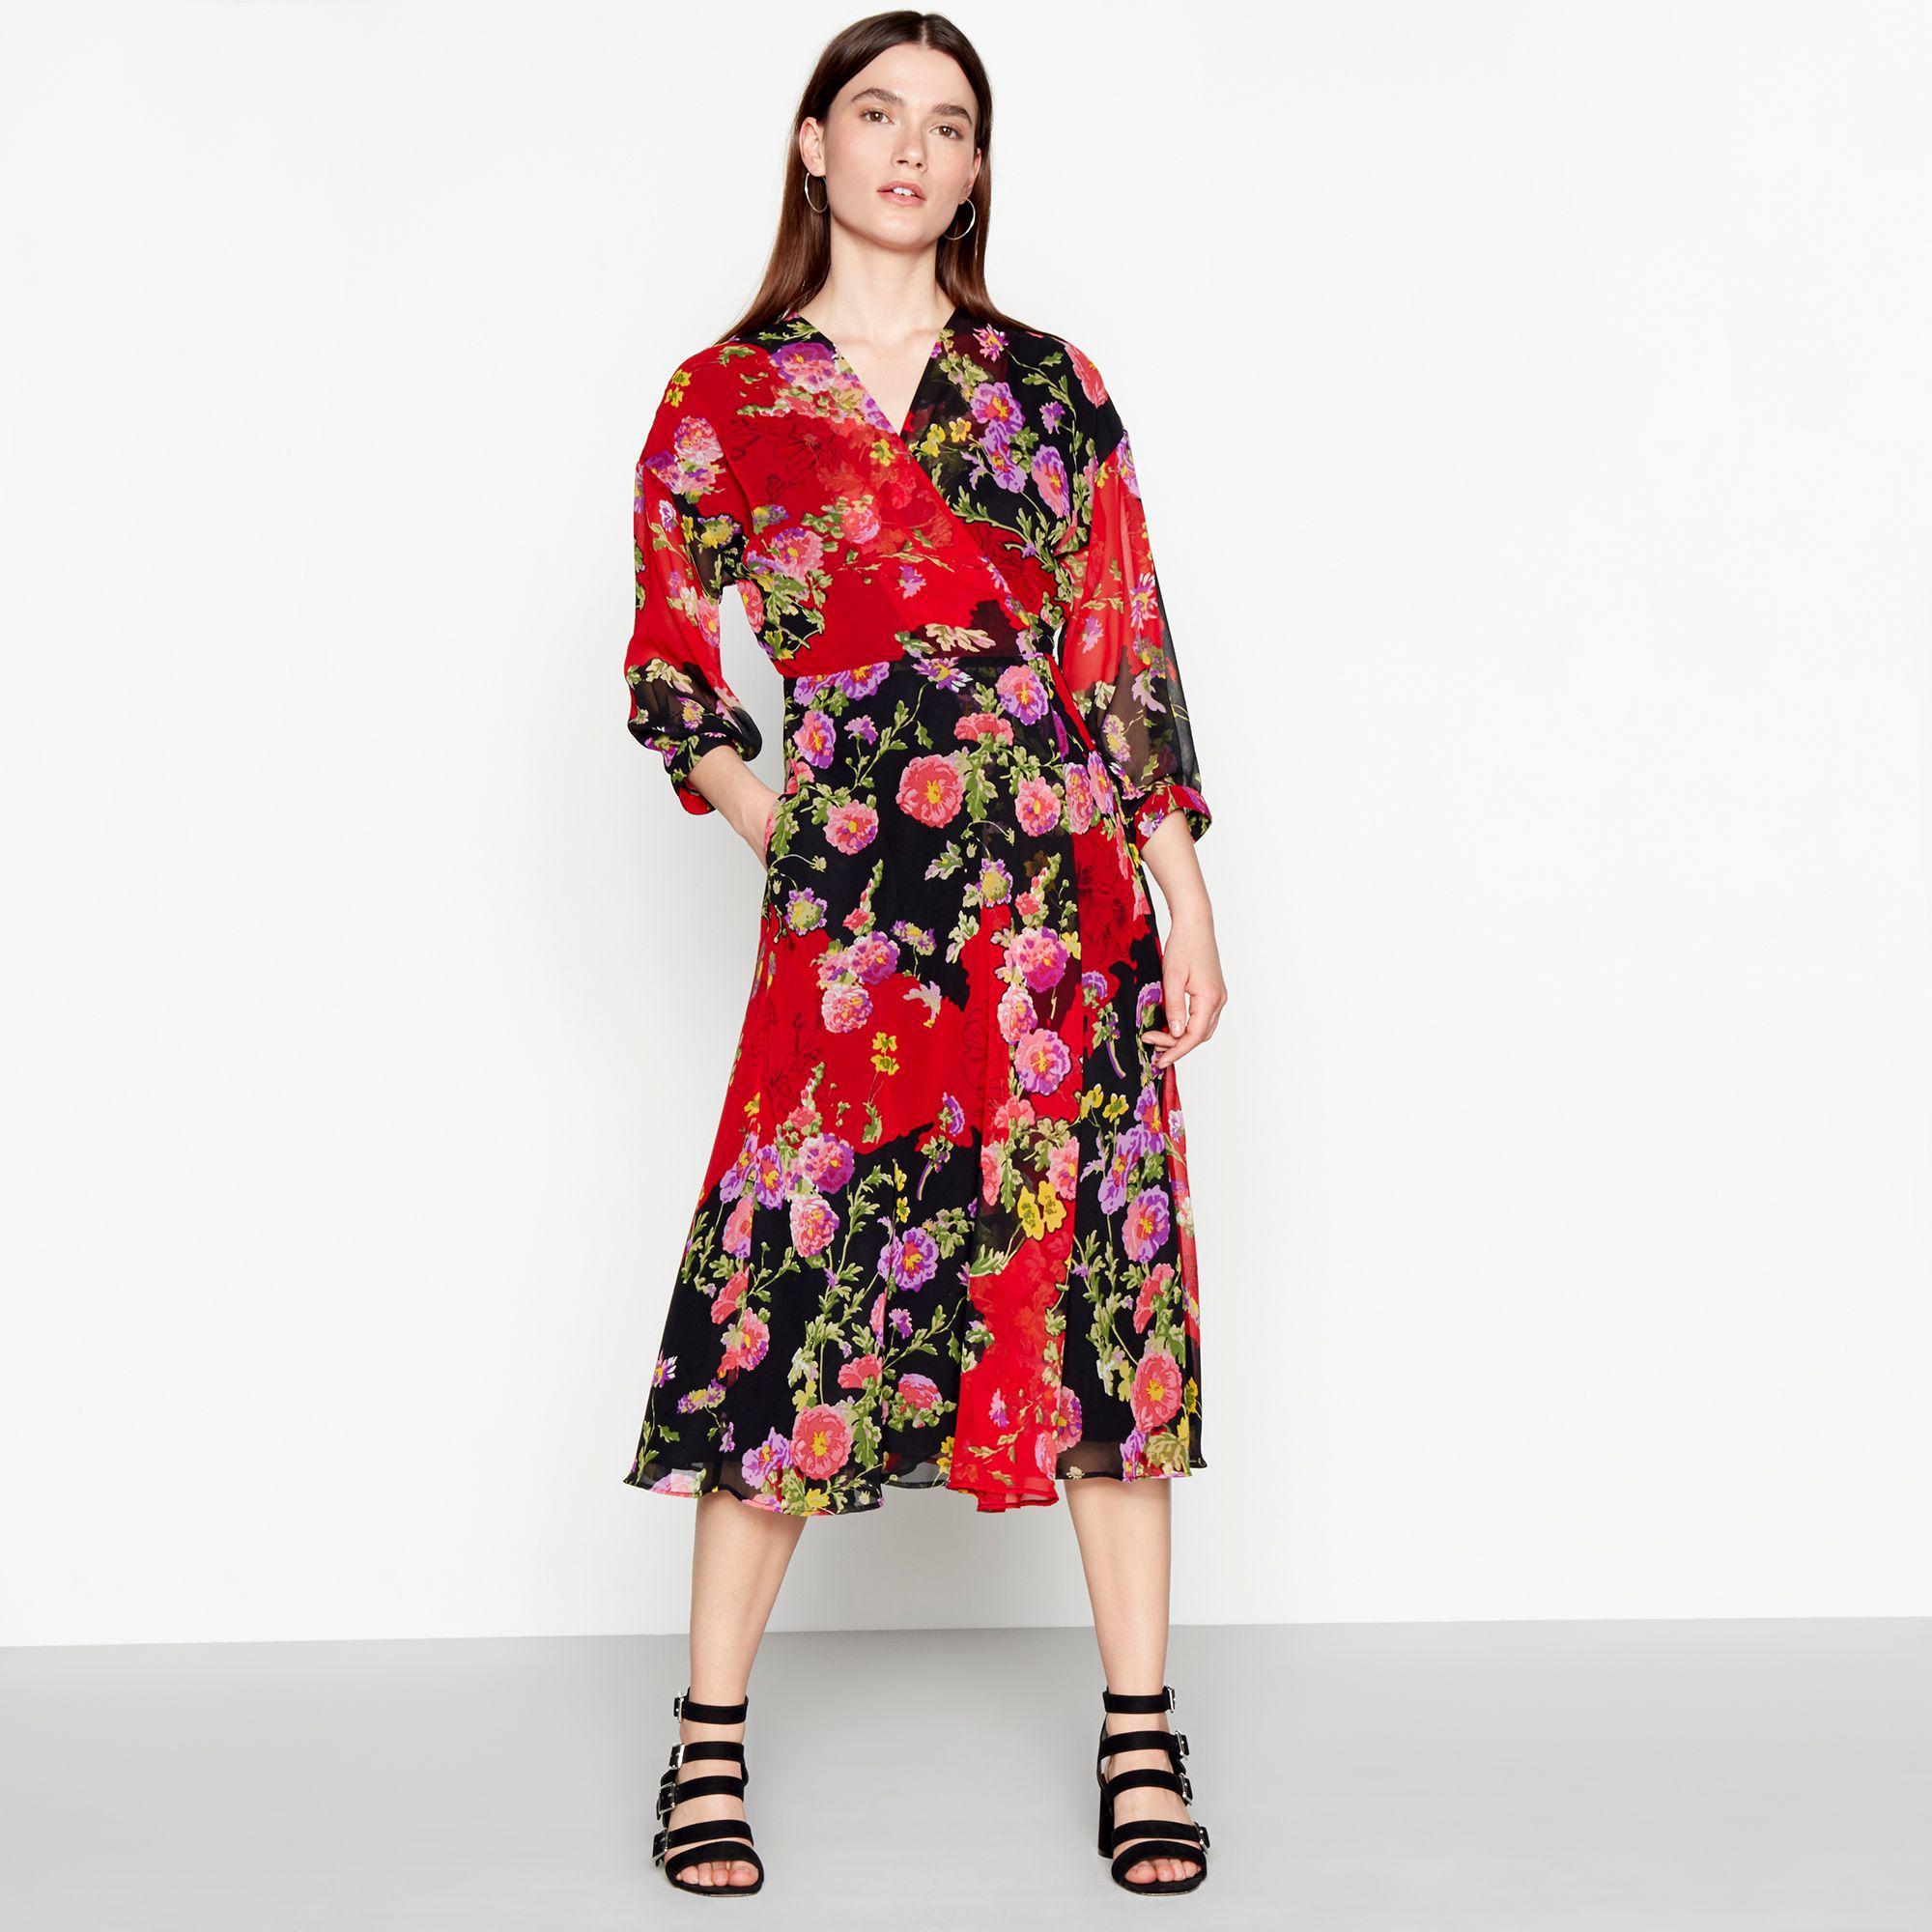 ddab60eba77e Preen By Thornton Bregazzi Red Floral Print Chiffon V-neck Long ...